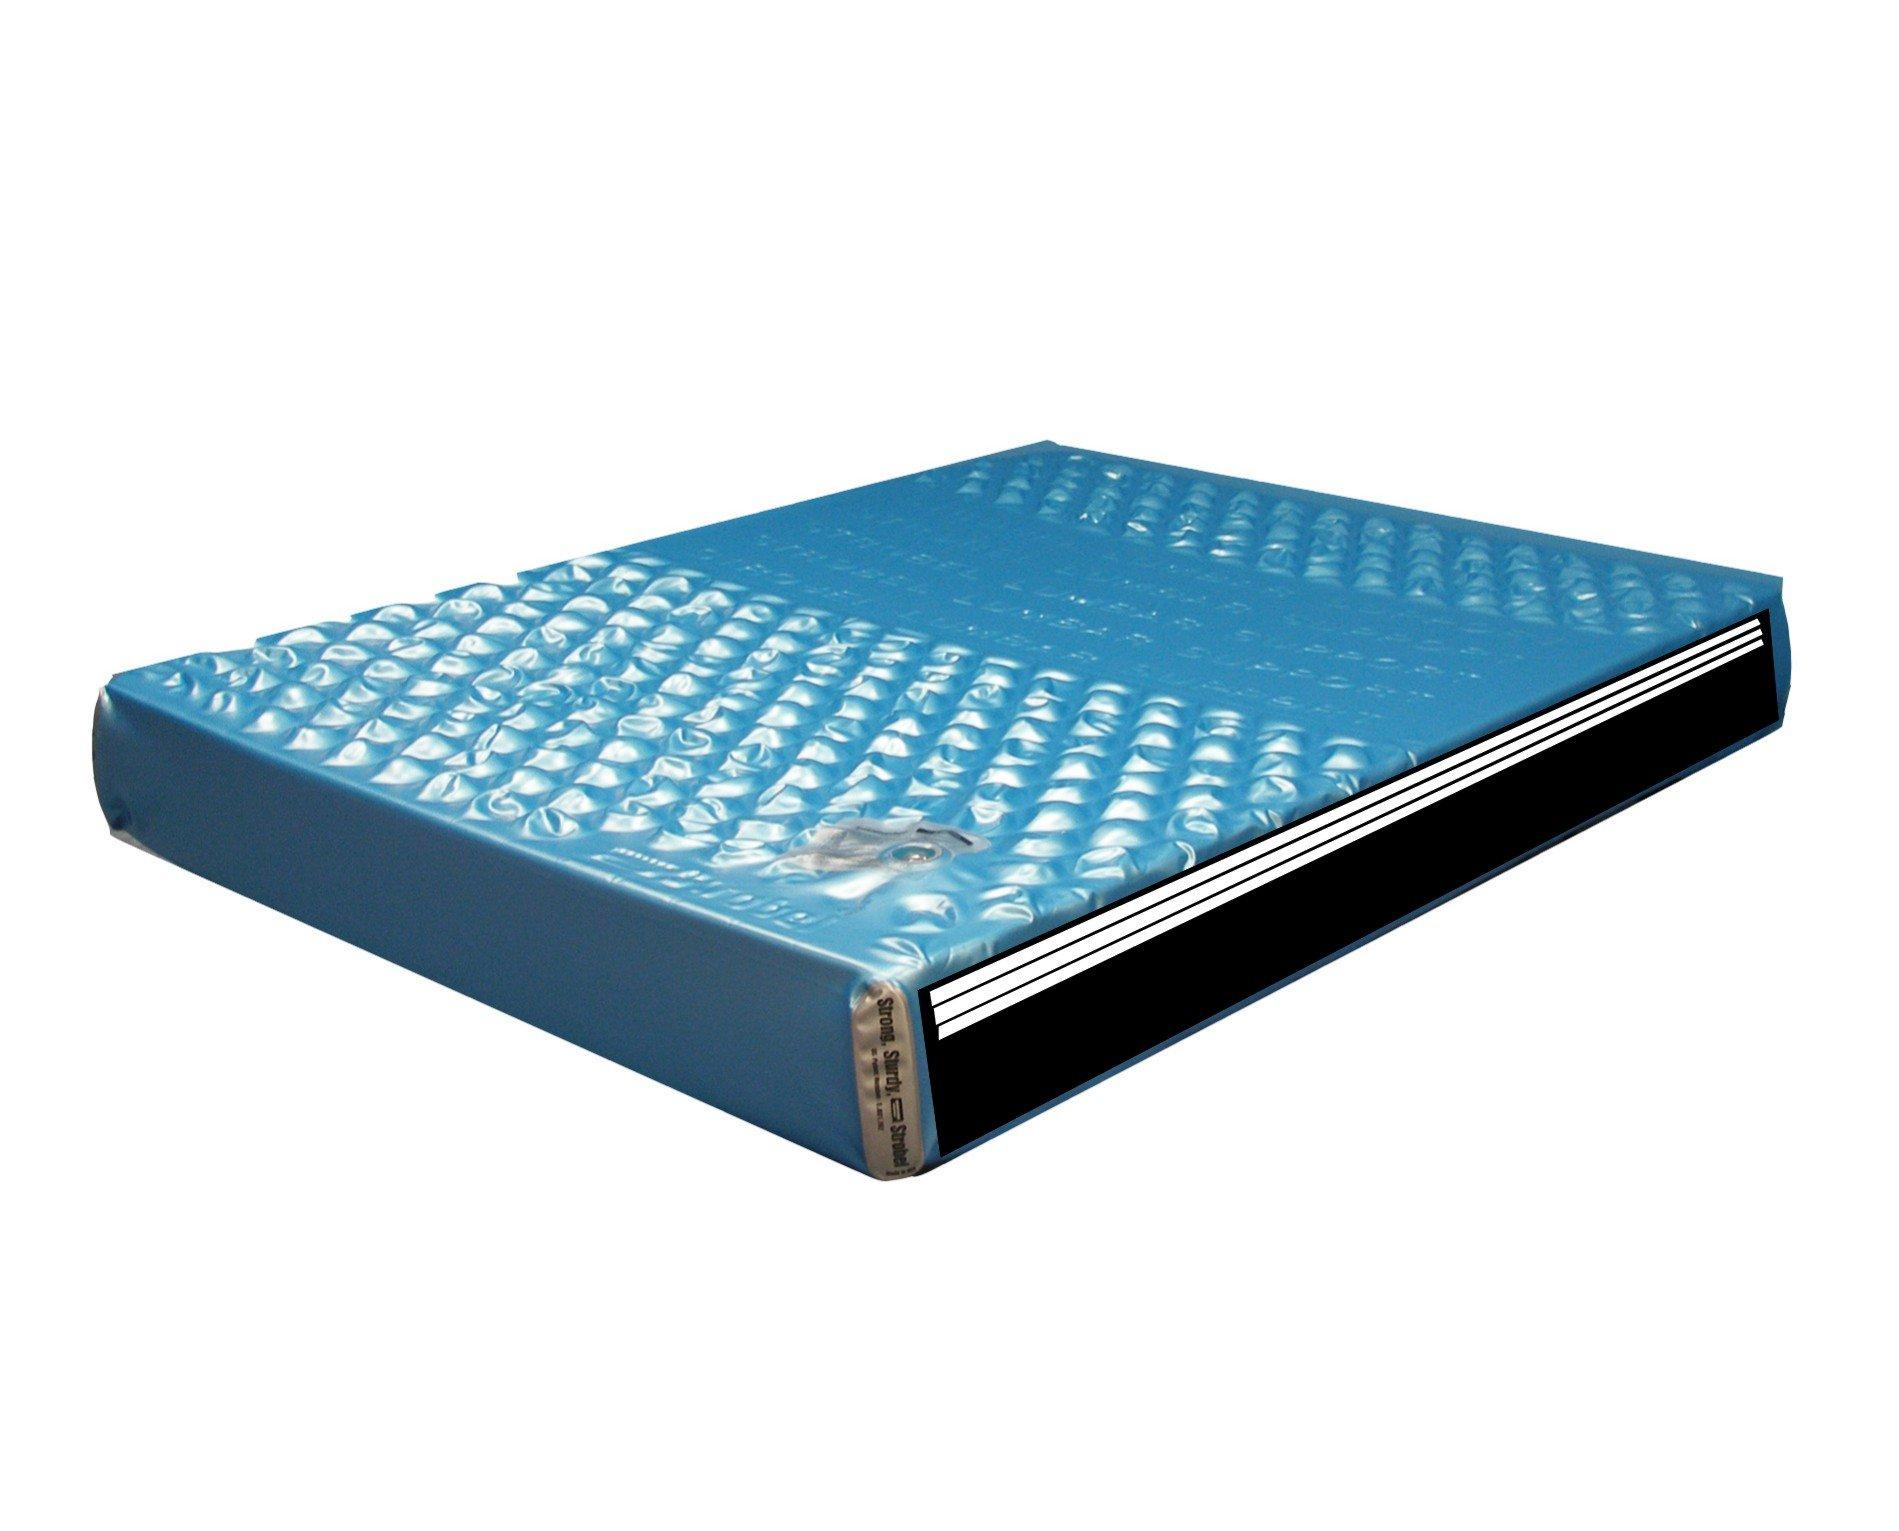 Strobel Organic Premium Hydro-Support 303 Waterbed Mattress 3 Layer Waveless King by Strobel Organic